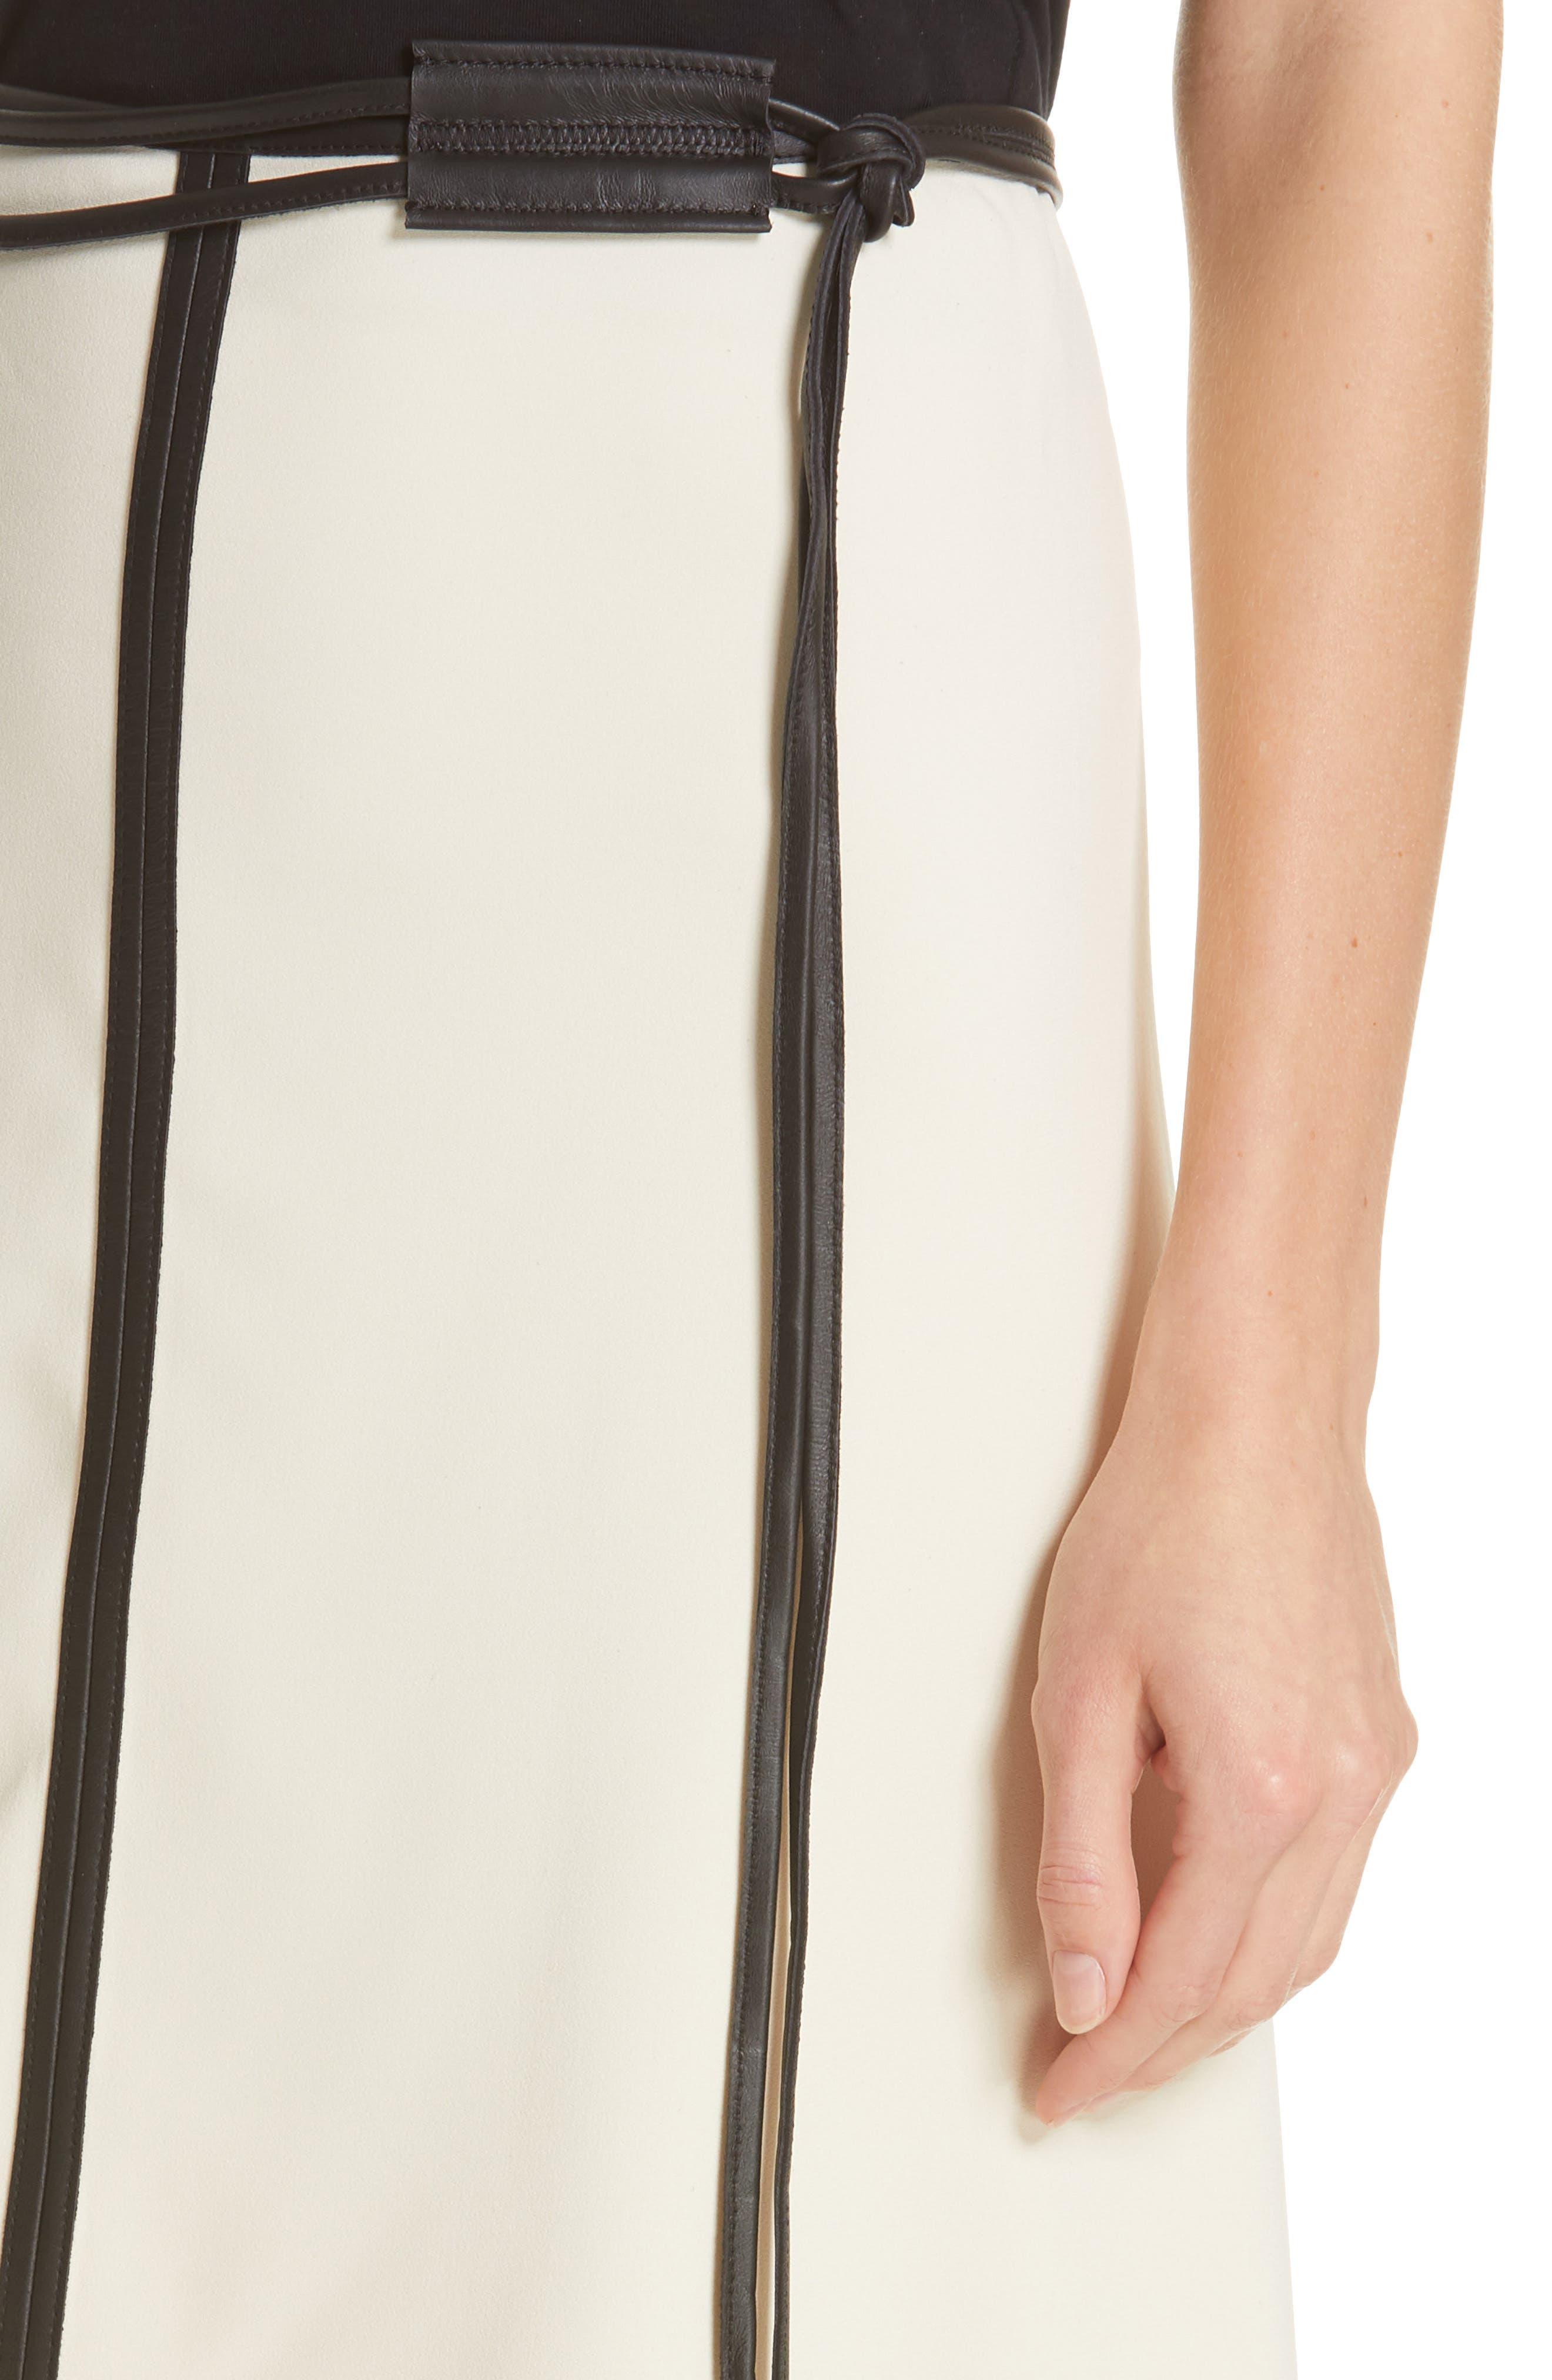 VICTORIA BECKHAM, Leather Trim Midi Skirt, Alternate thumbnail 4, color, MILK/ BLACK